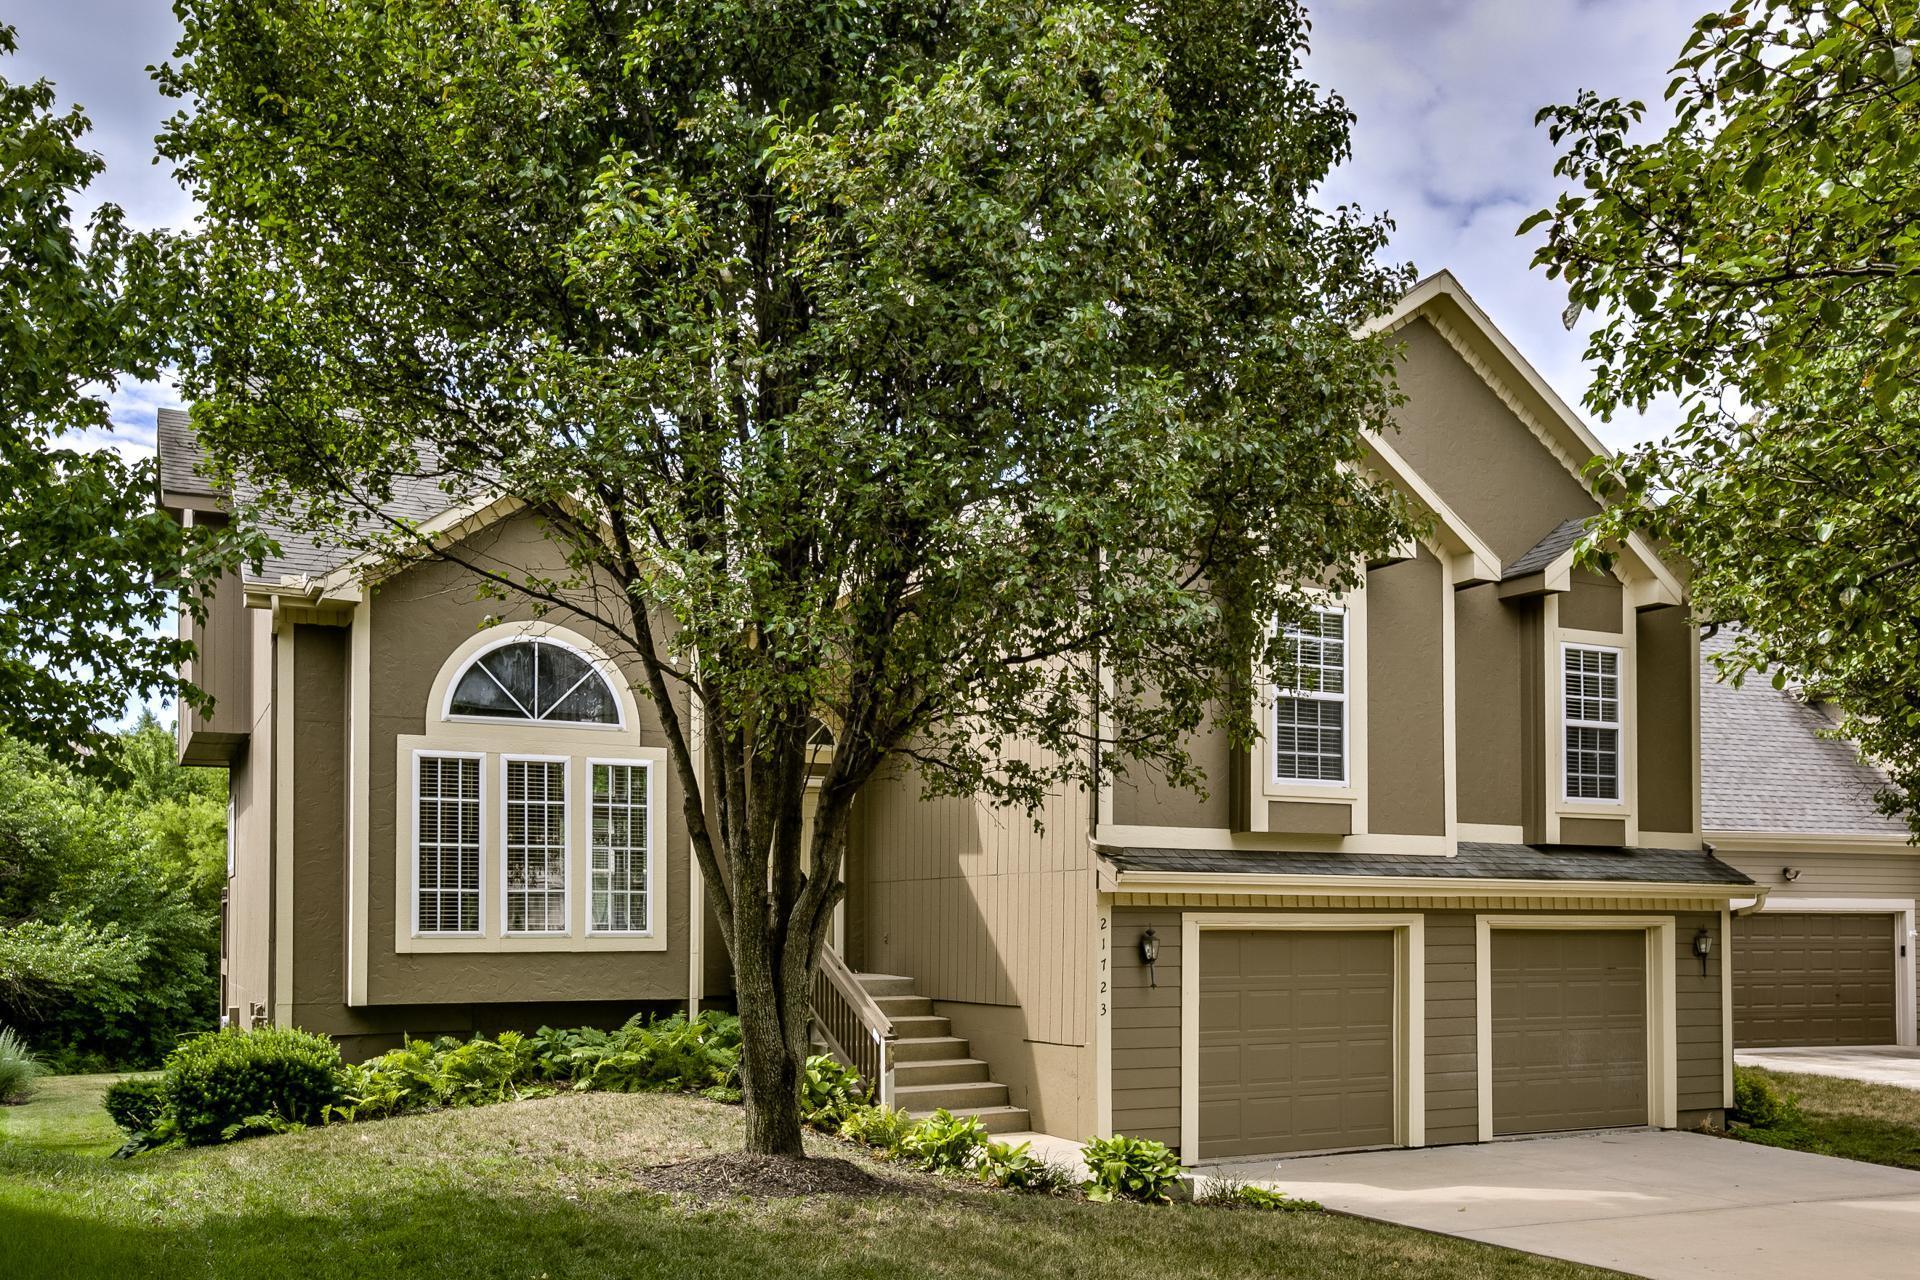 21723 W 122nd St, Olathe, KS 66061 For Rent | Trulia